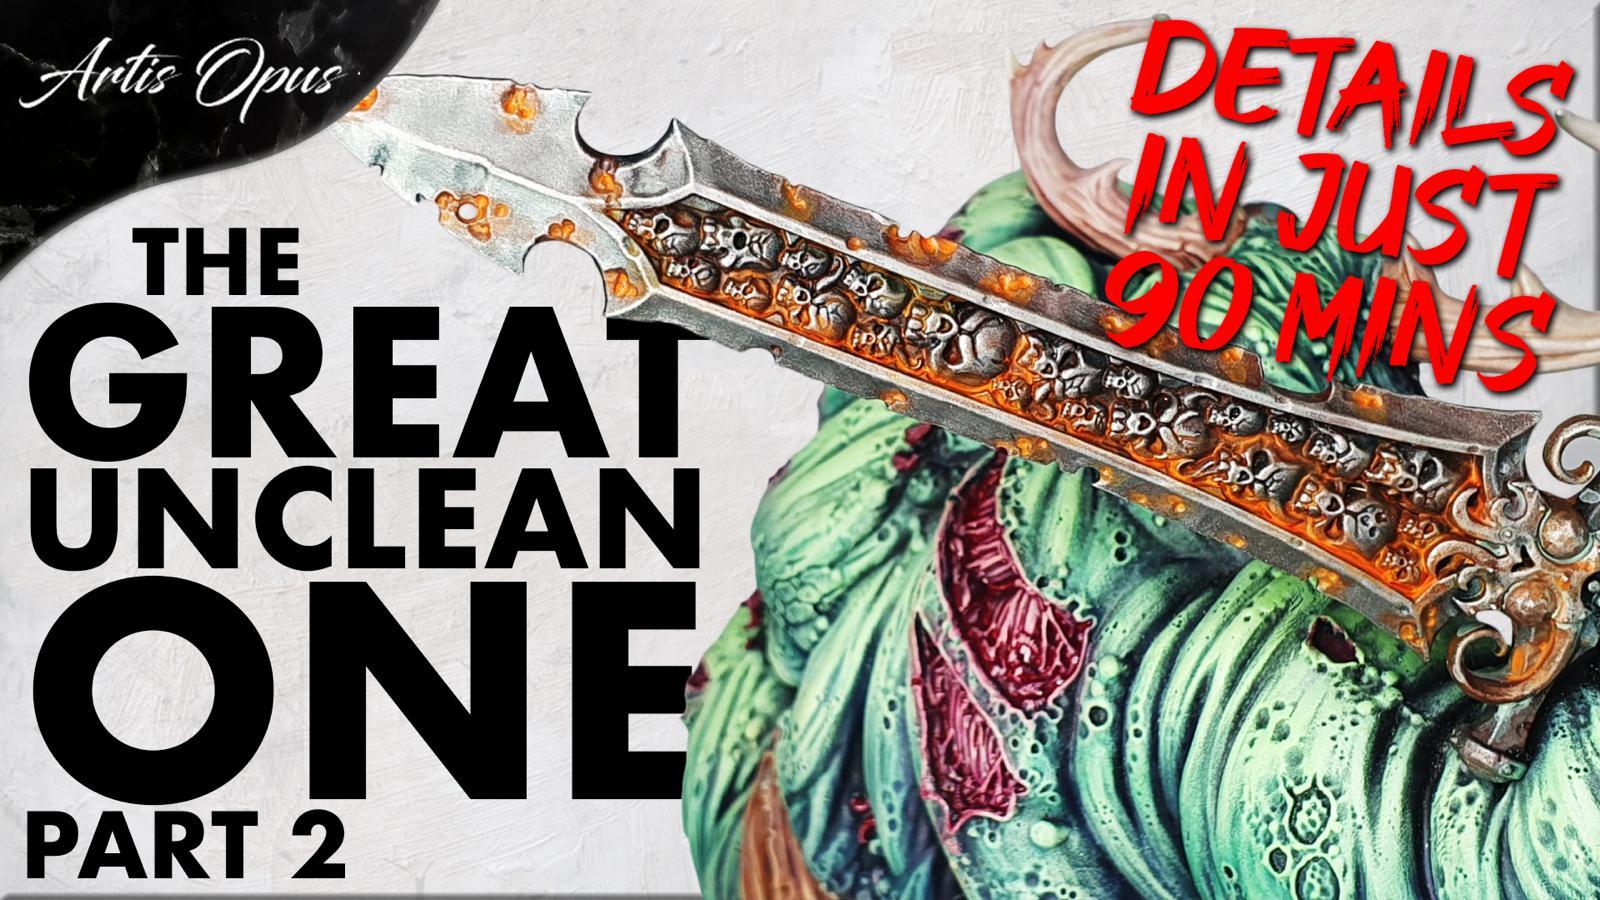 Artis Opus Great Unclean One pt2 Bundle